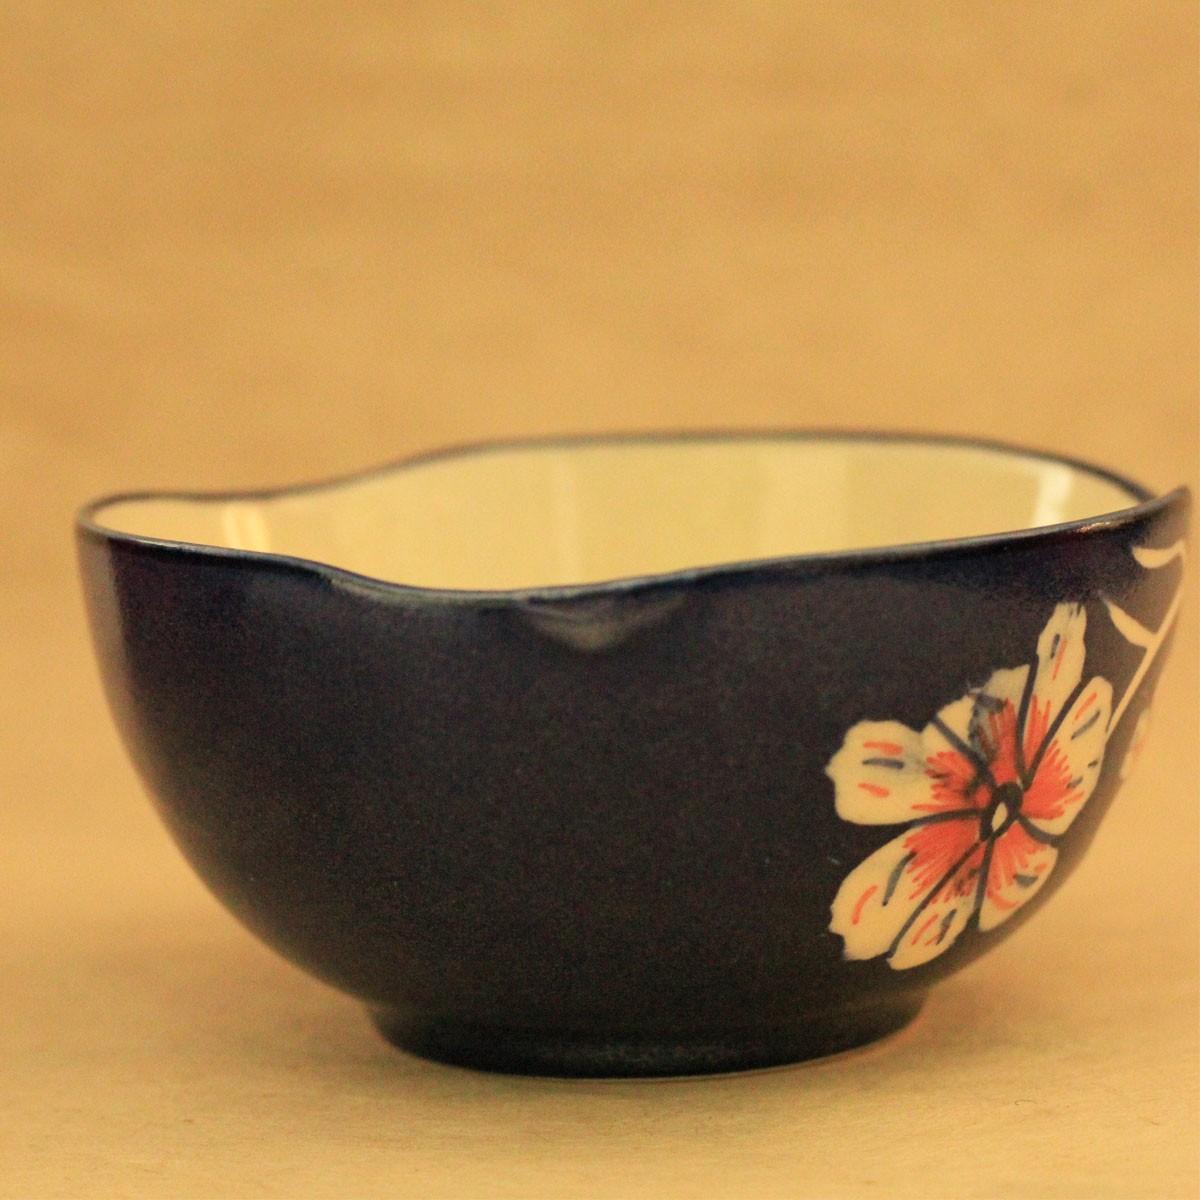 Ceramic Floral Bowl